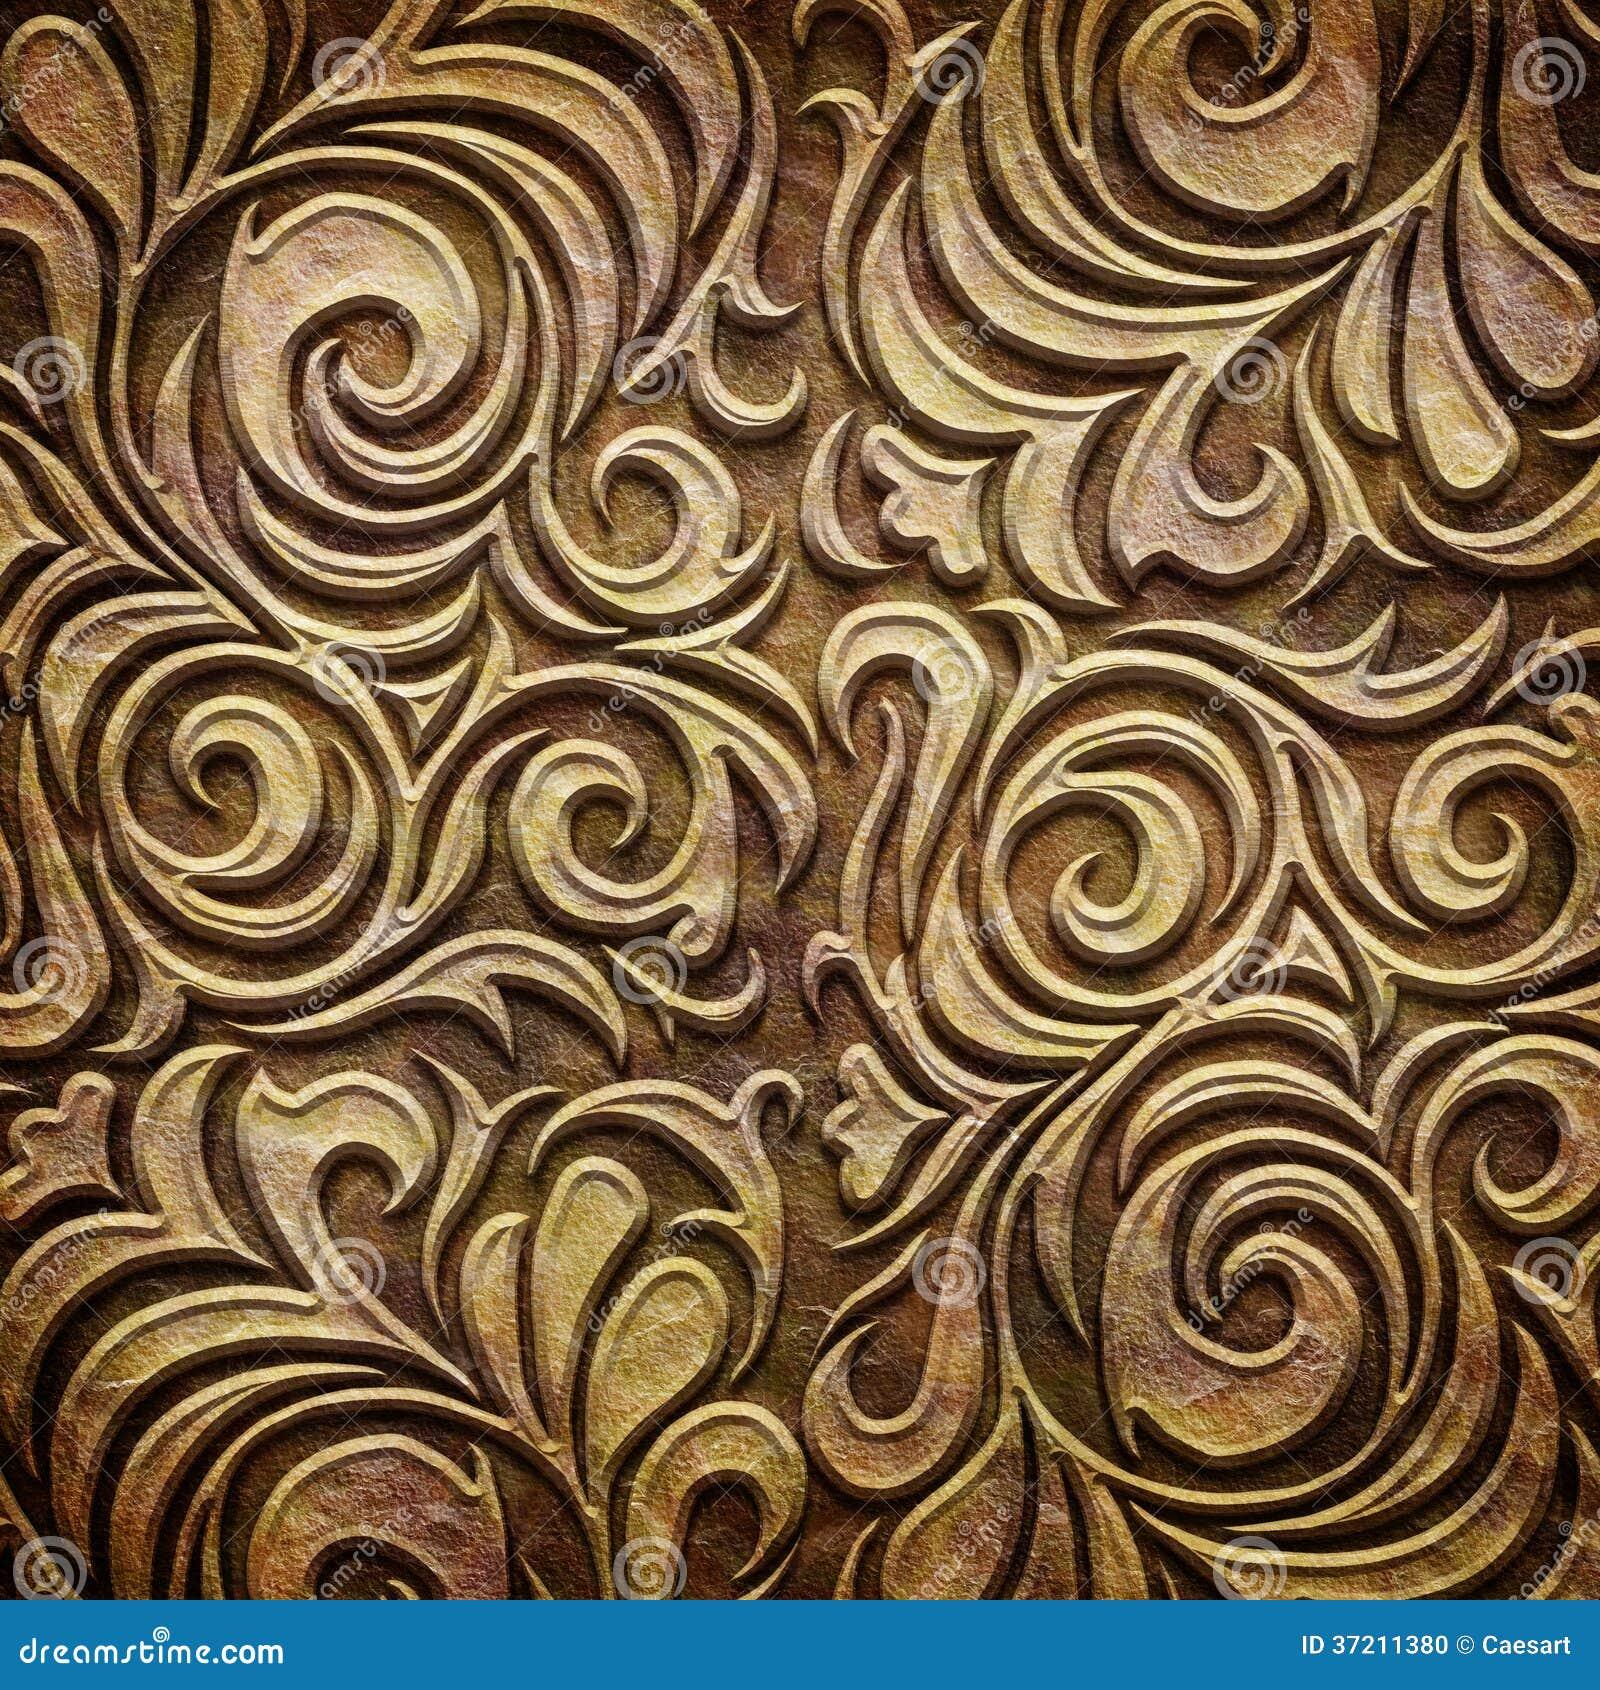 gold metall muster auf papier backgrond stockfoto bild 37211380. Black Bedroom Furniture Sets. Home Design Ideas